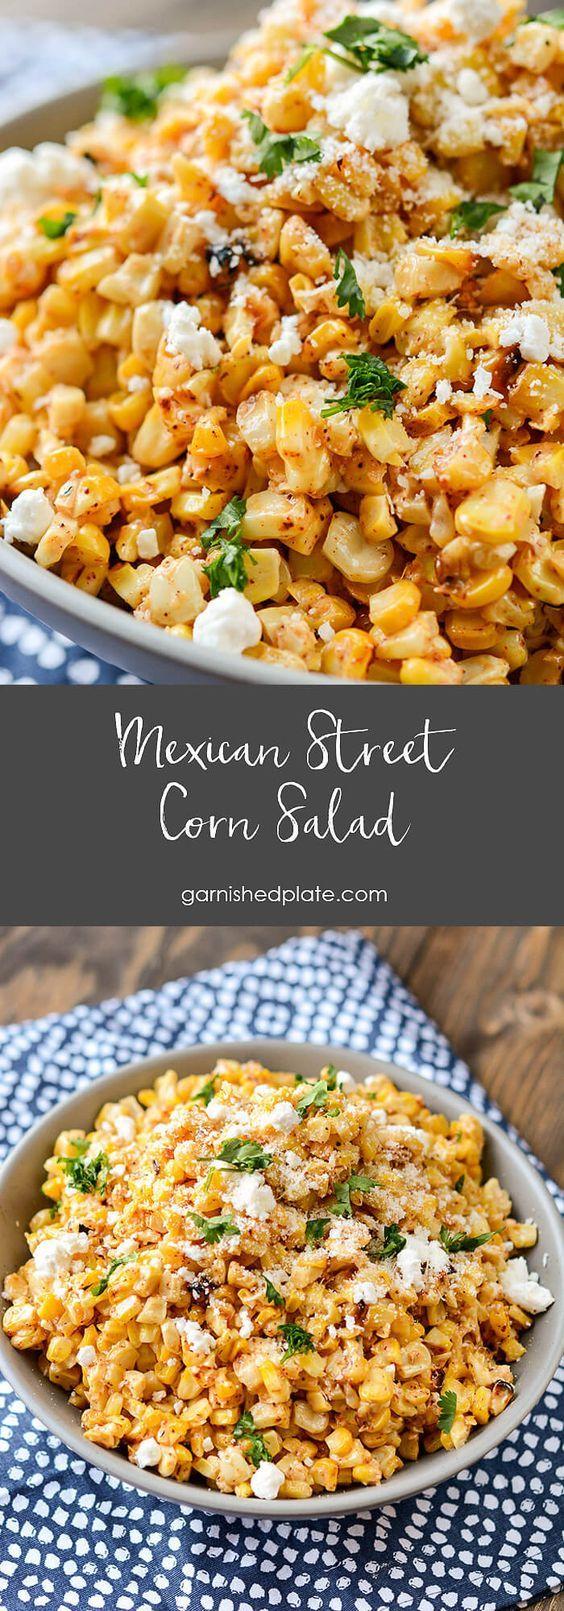 Mexican Street Corn Salad - Garnished Plate